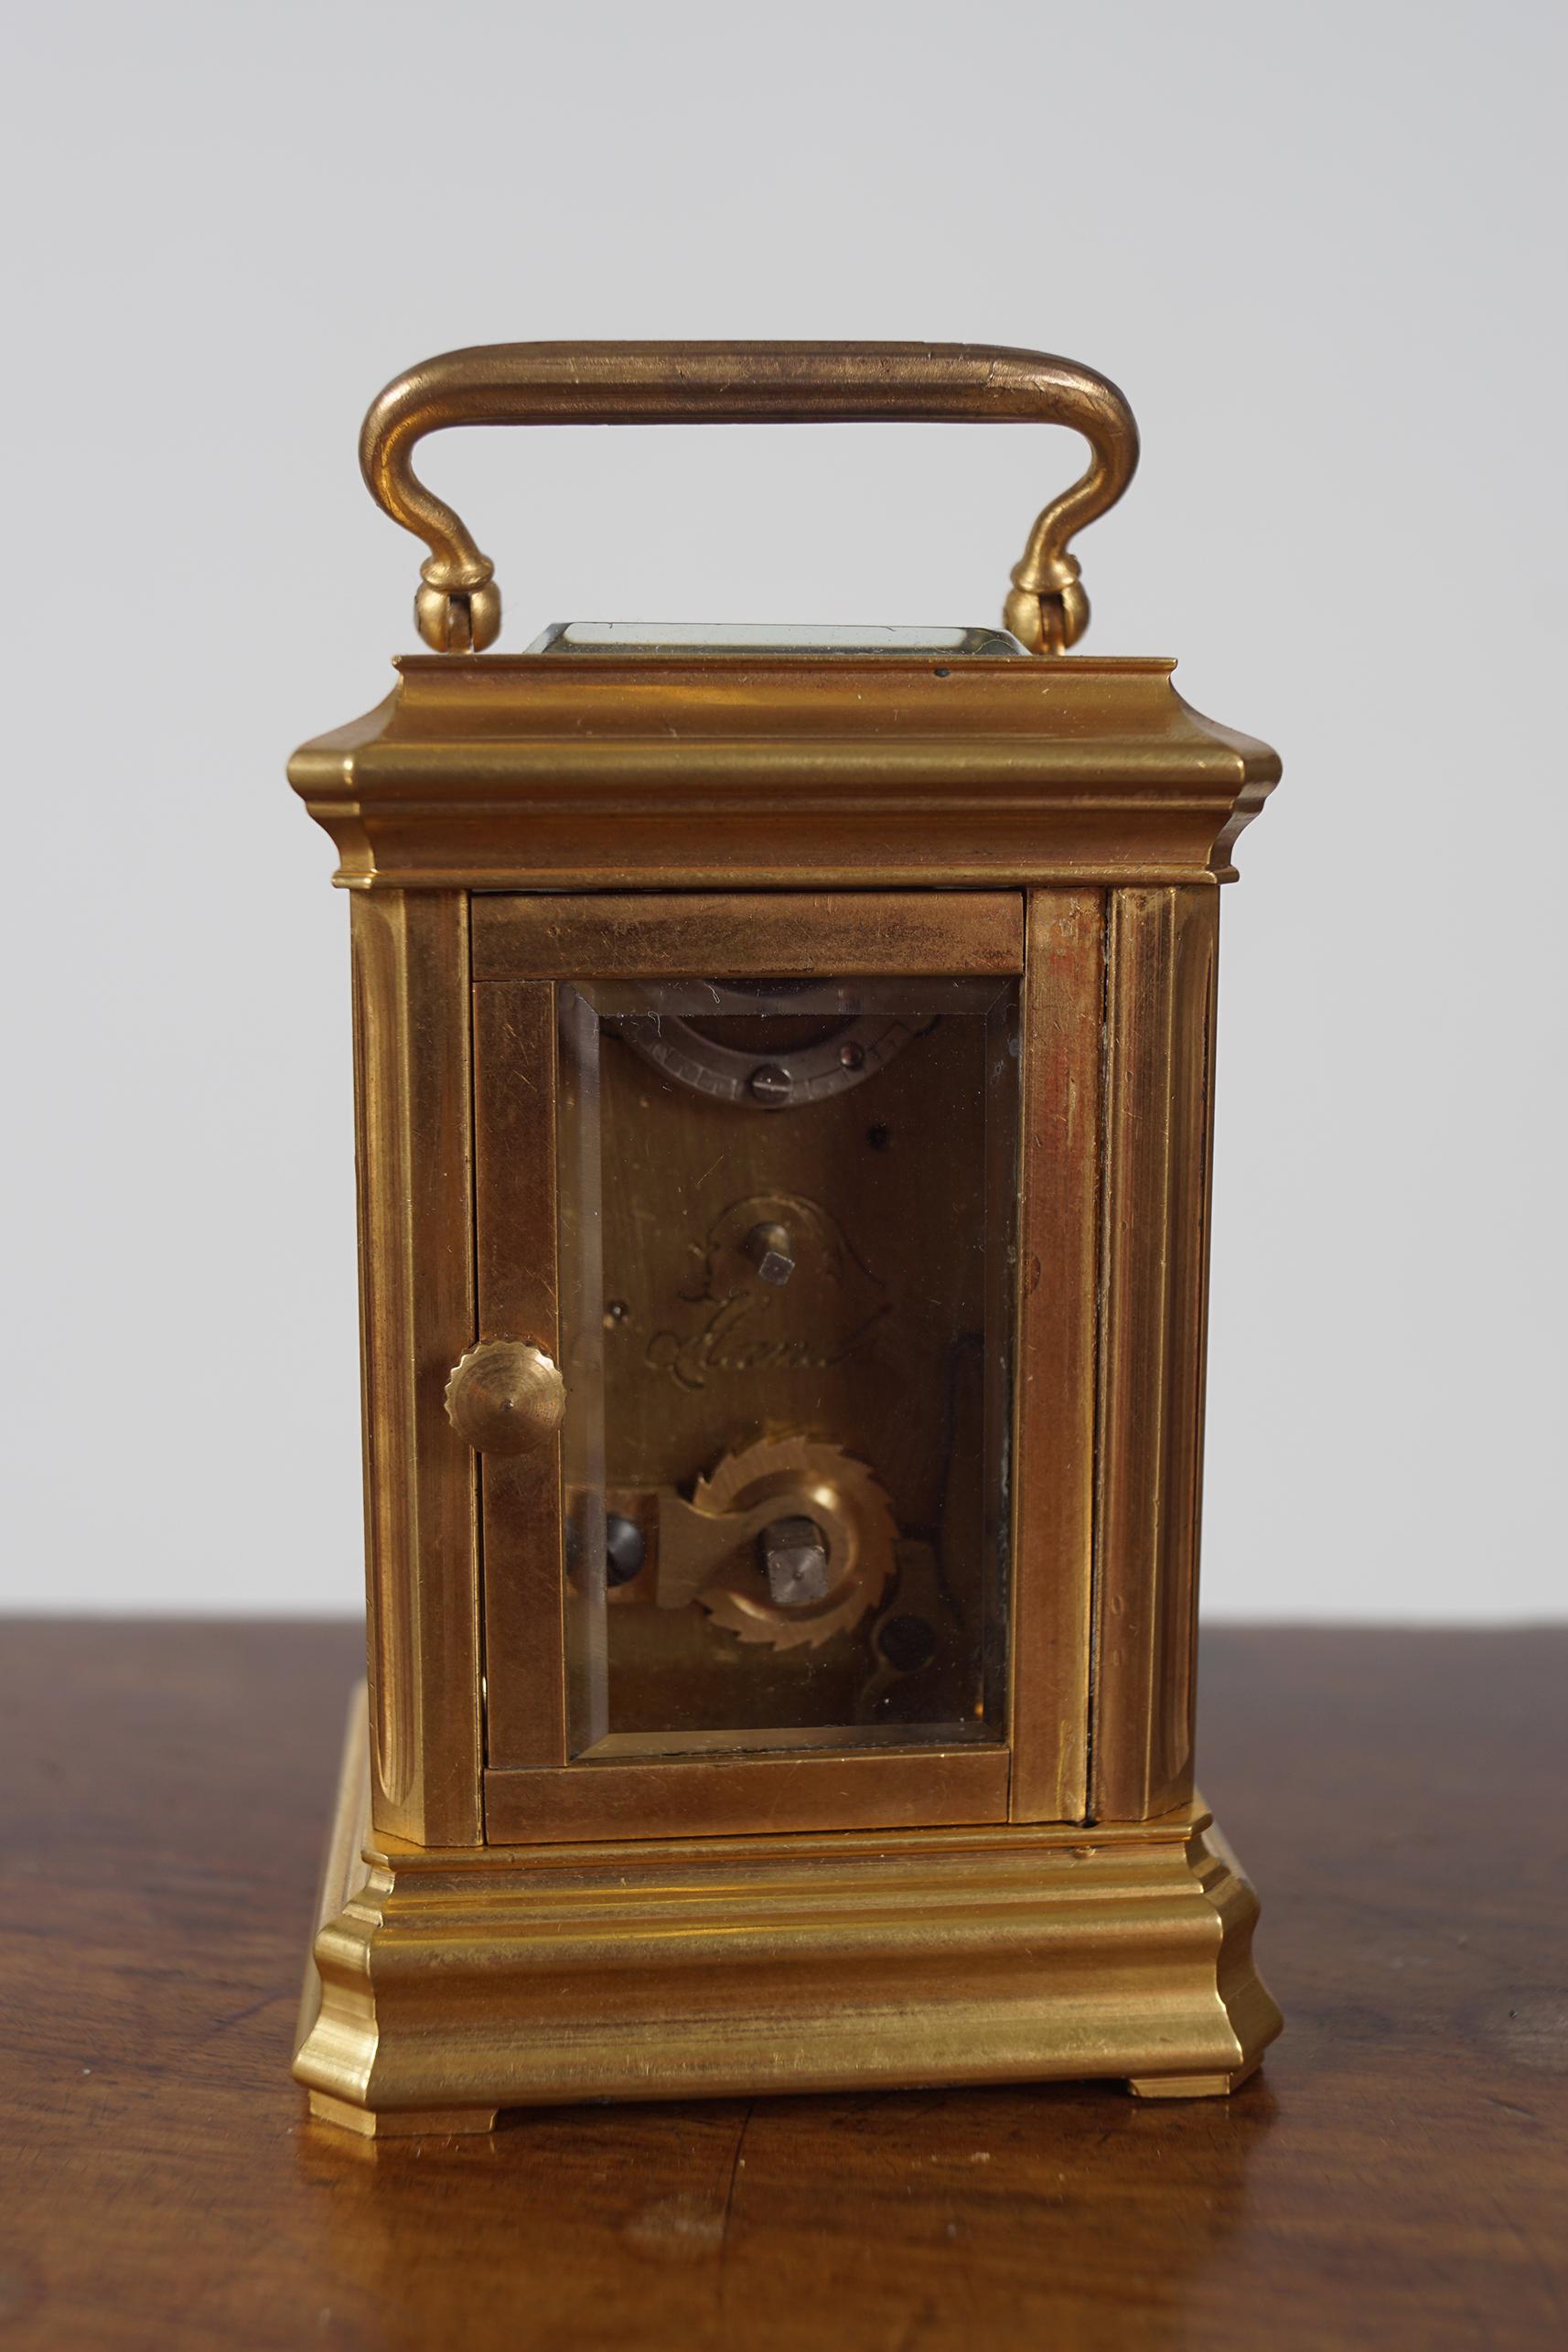 MINIATURE BRASS CARRIAGE CLOCK - Image 3 of 4